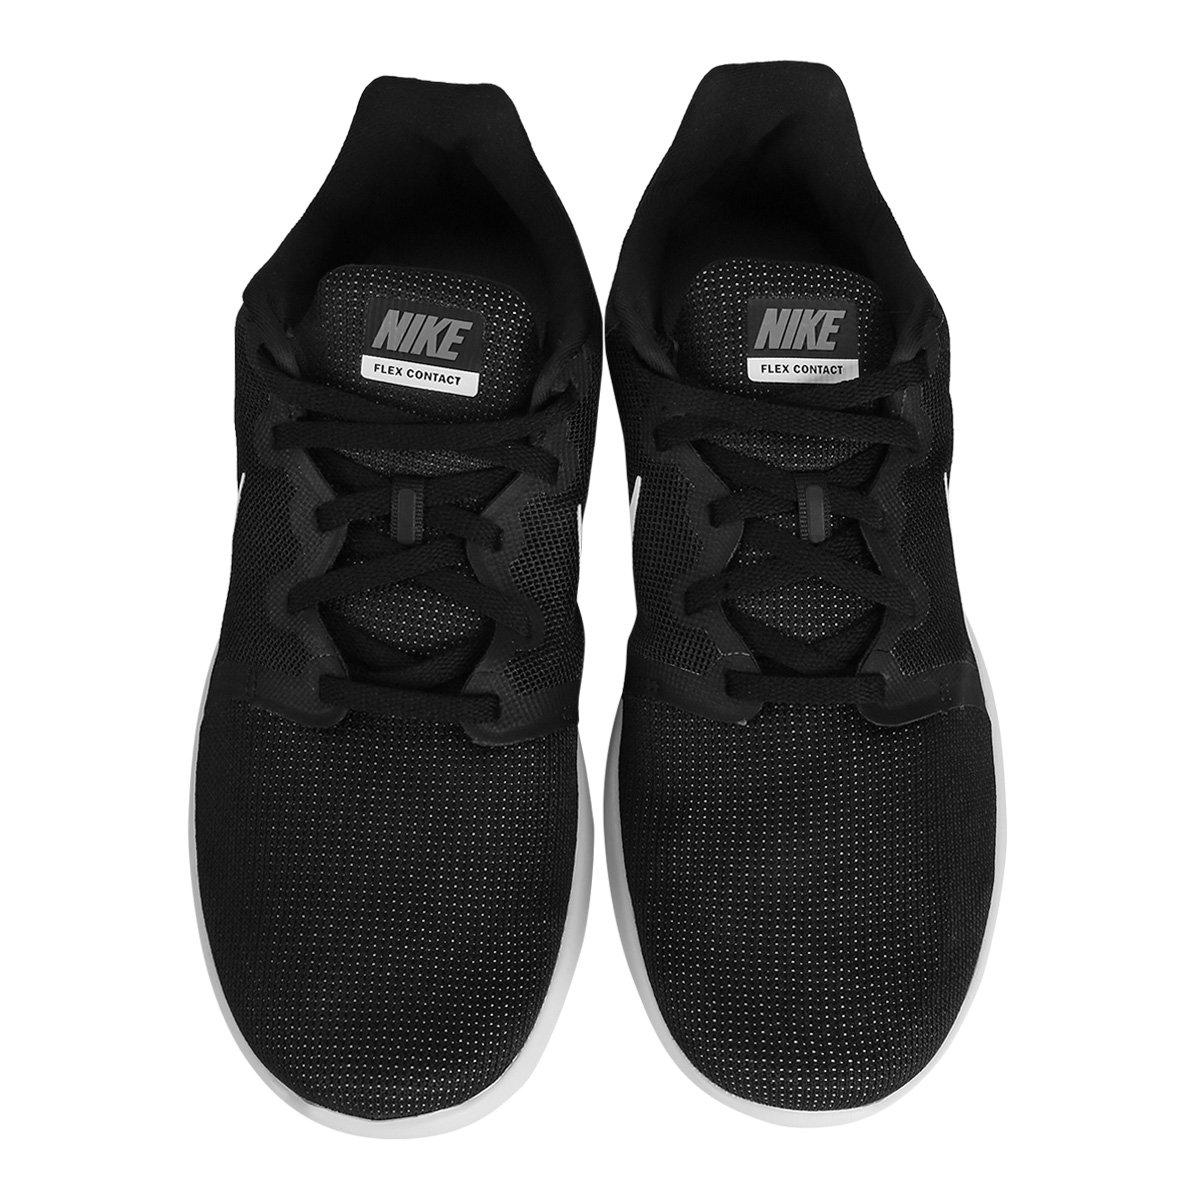 6d0460c347edc Tênis Nike Flex Contact 2 Masculino - Preto e Branco - Compre Agora ...